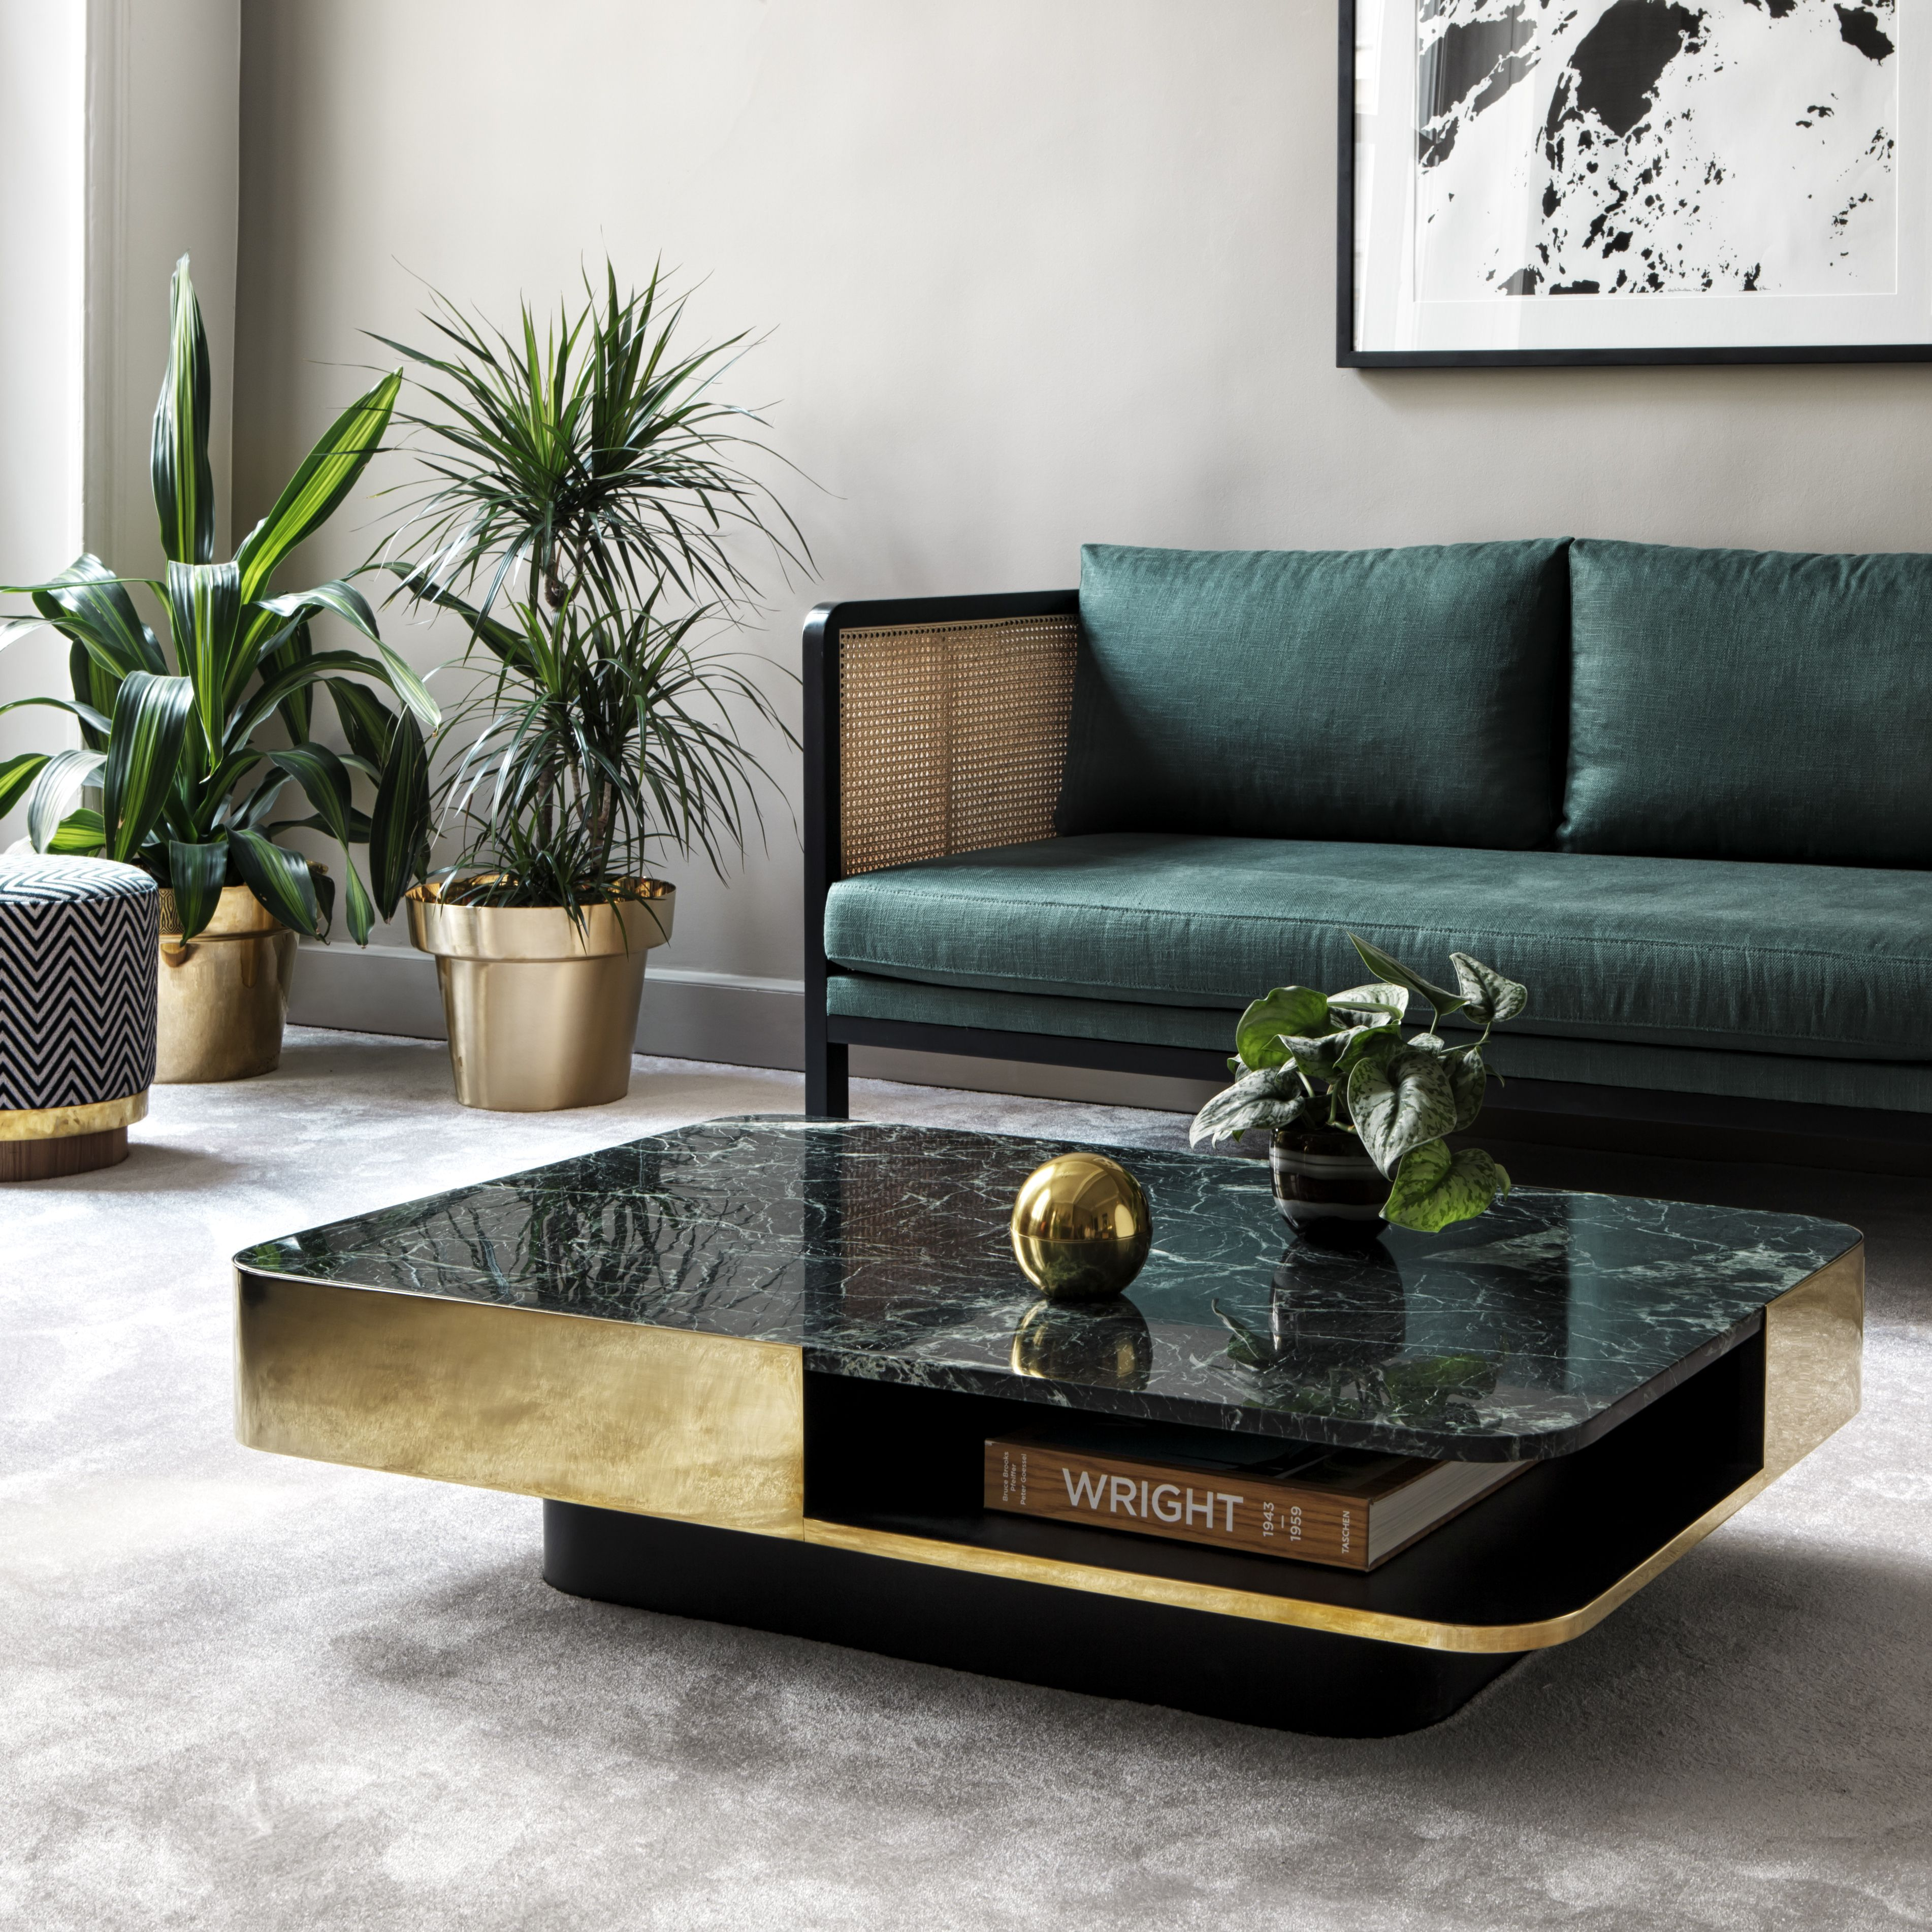 Table Basse Lounge Marbre Vert Red Edition La Table Lounge Est